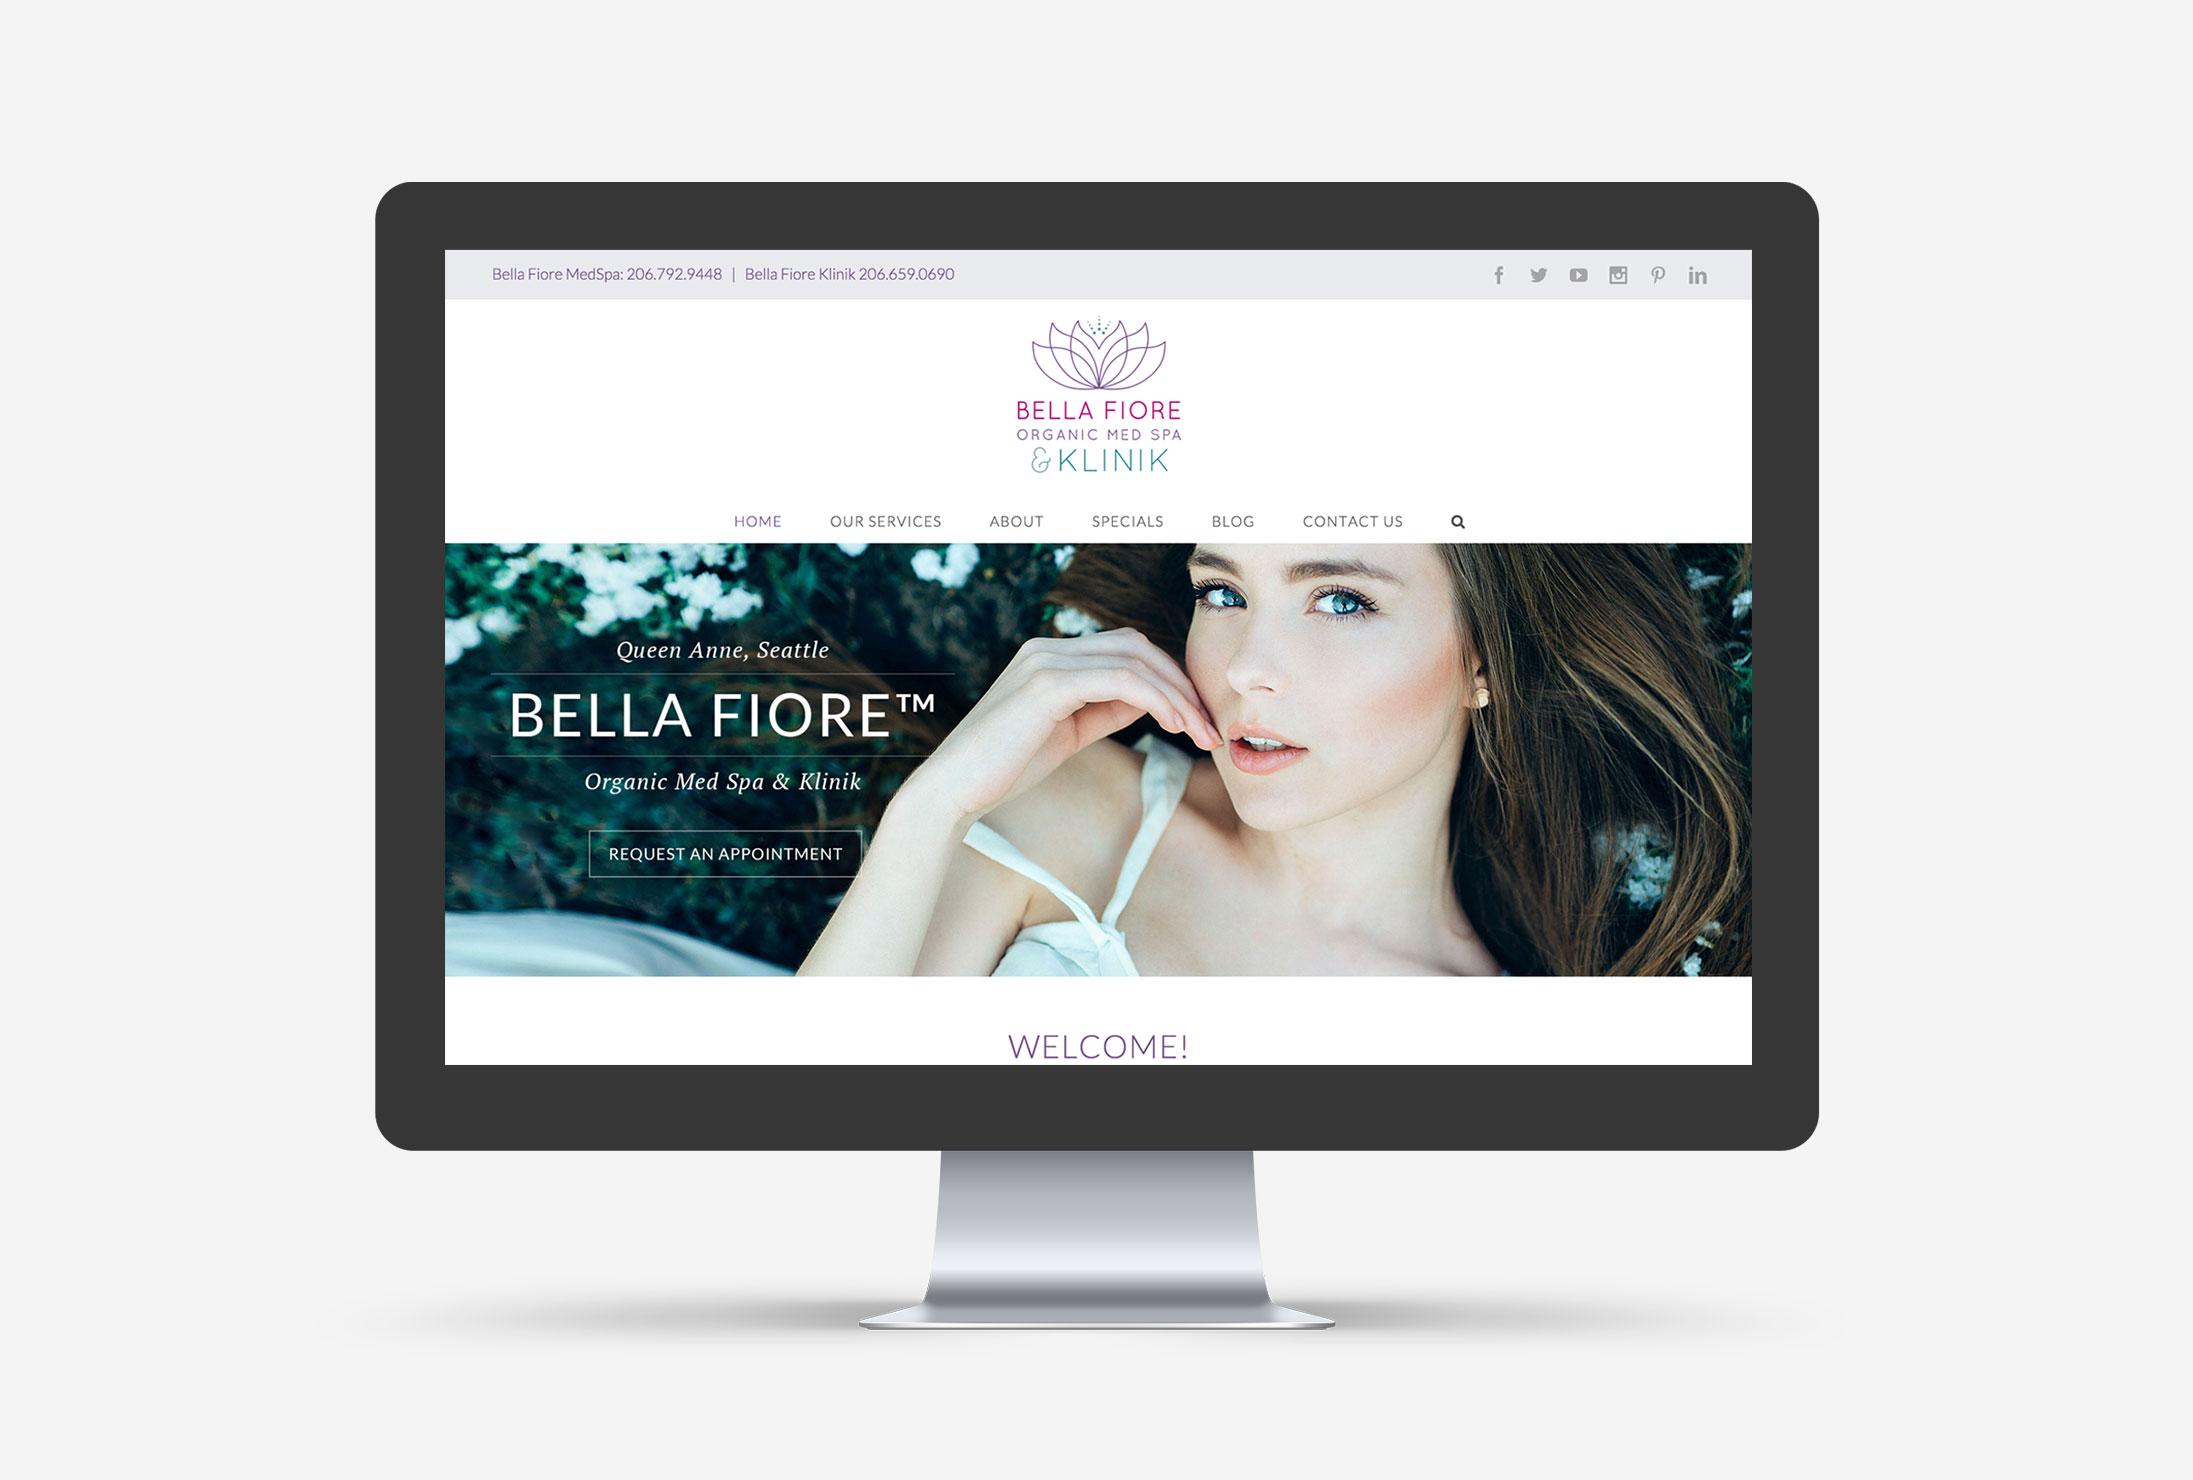 Bella Fiore MedSpa in Seattle - Cleveland Web Design by Blaz Design